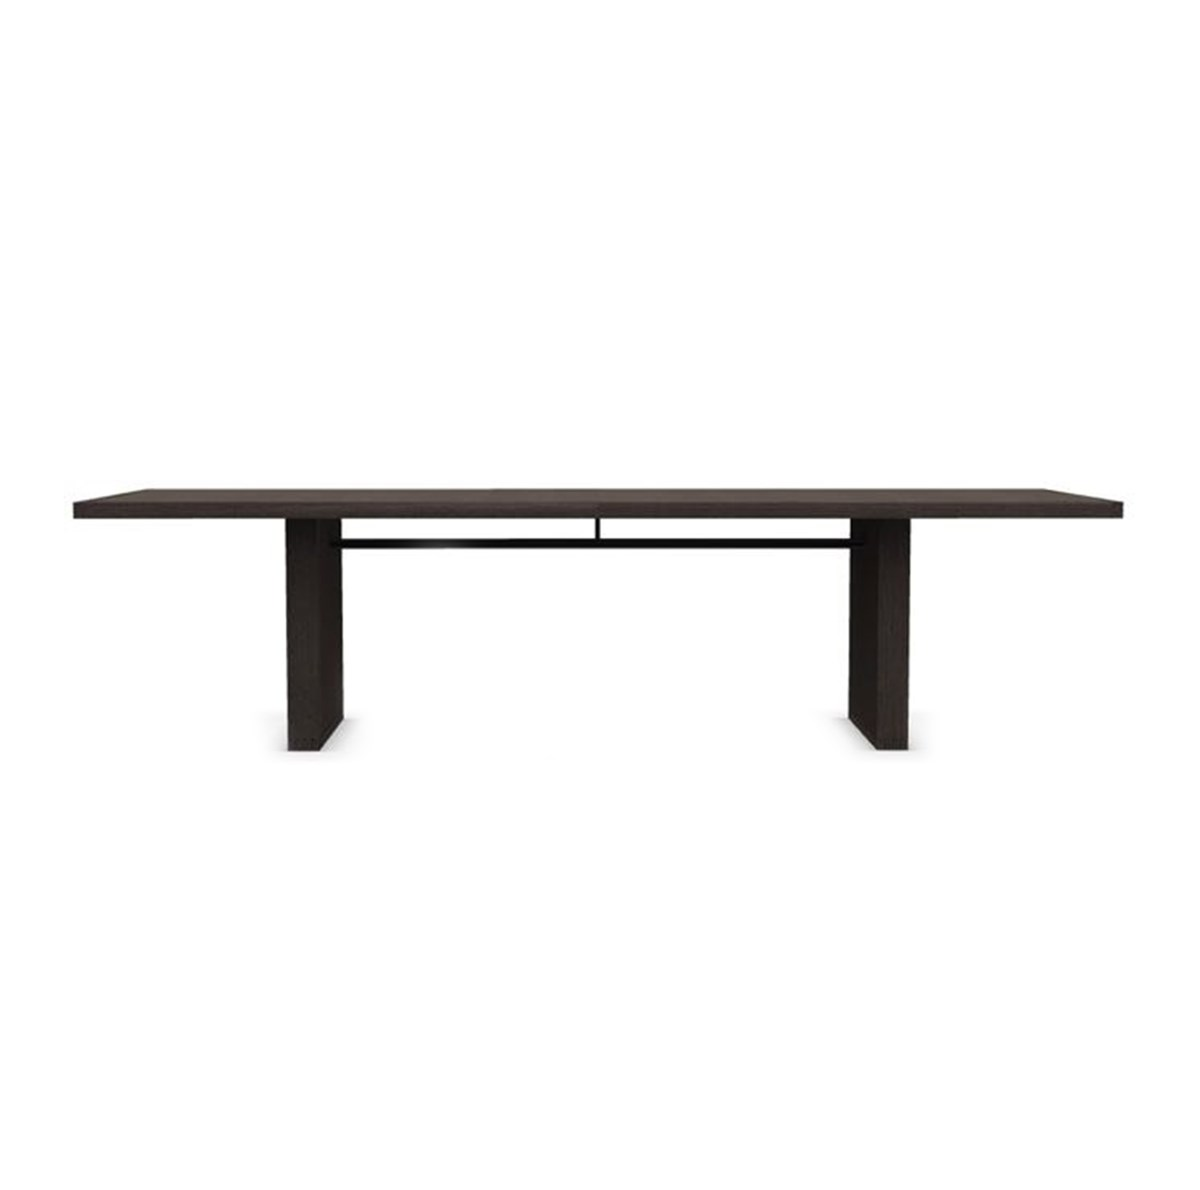 Maxalto-Antonio-Citterio-Simposio-Table-&-Musa-Chairs-Matisse-1